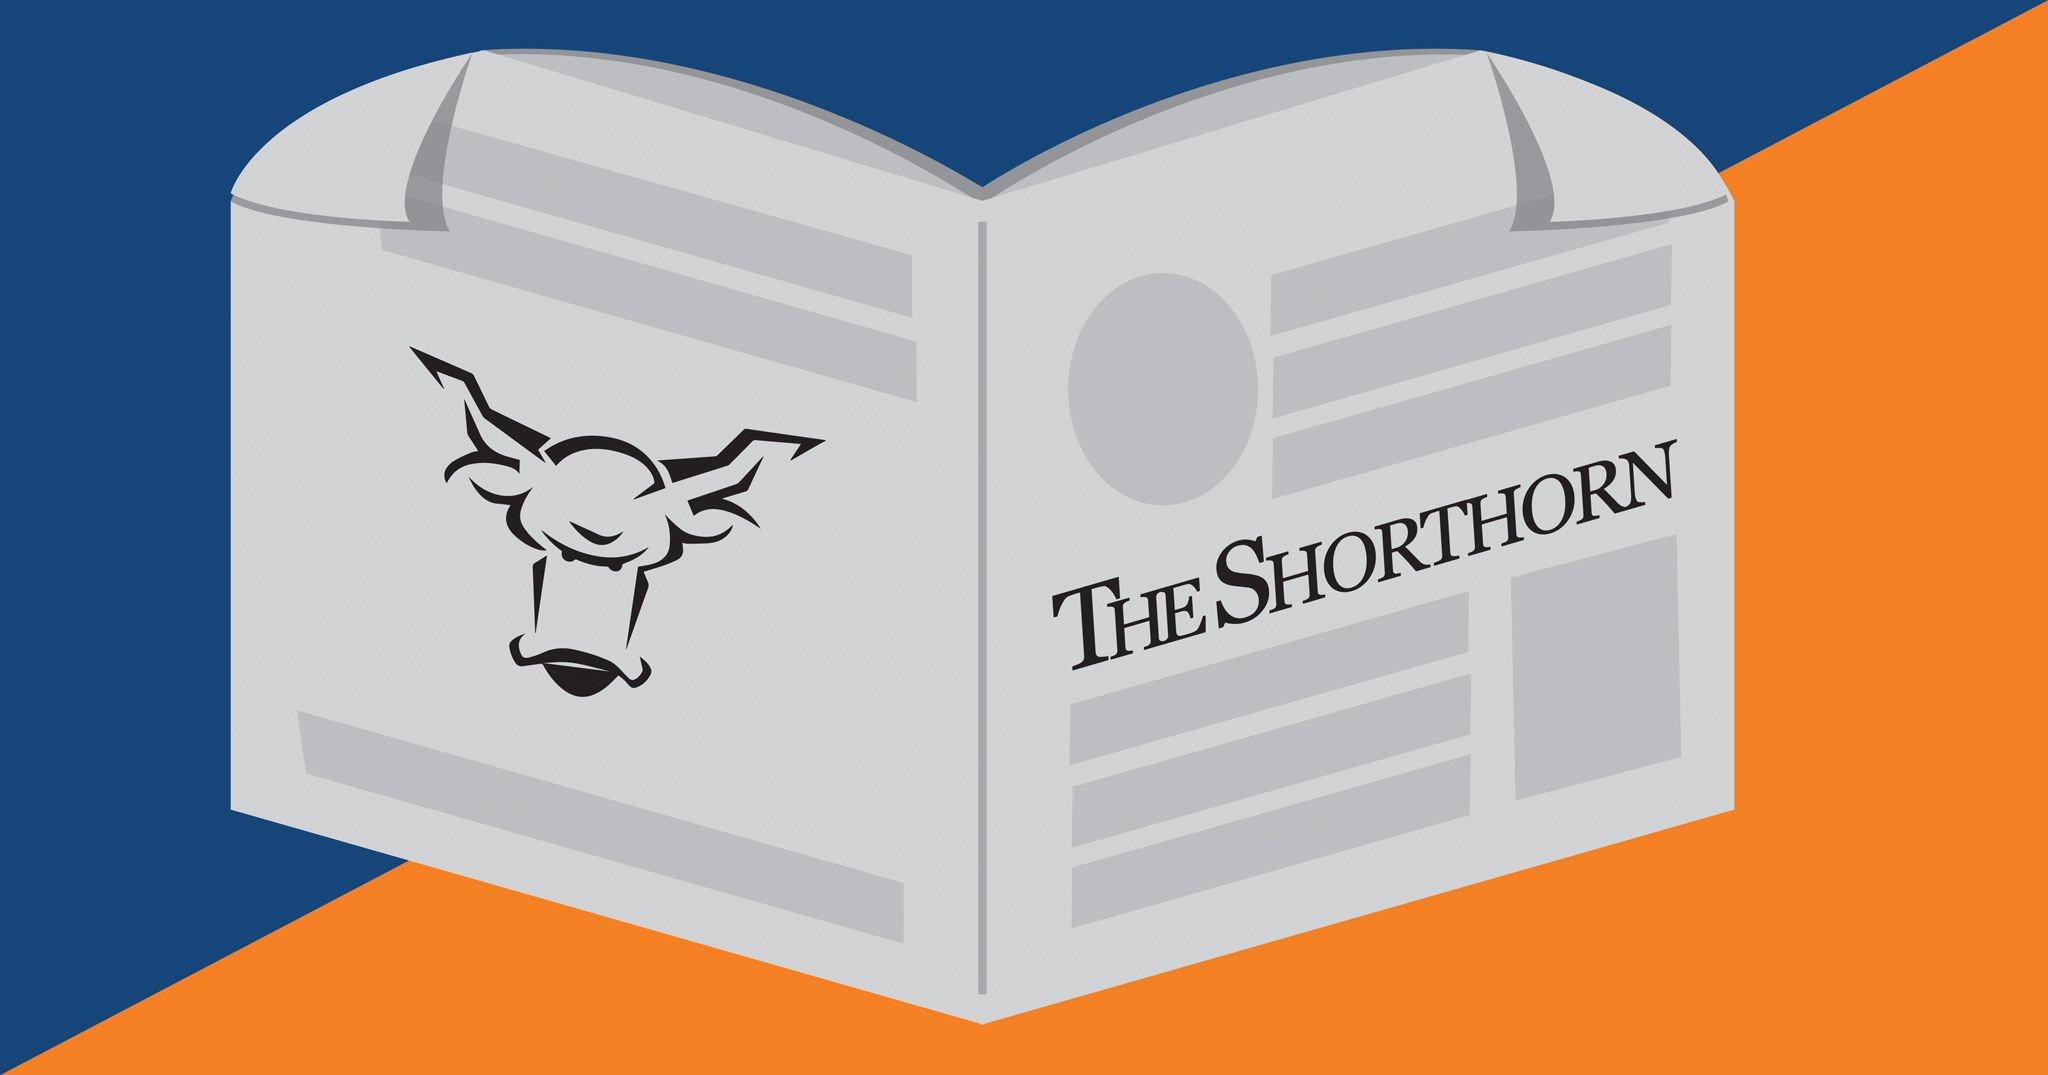 theshorthorn com | UT-Arlington's Main News Source Since 1919